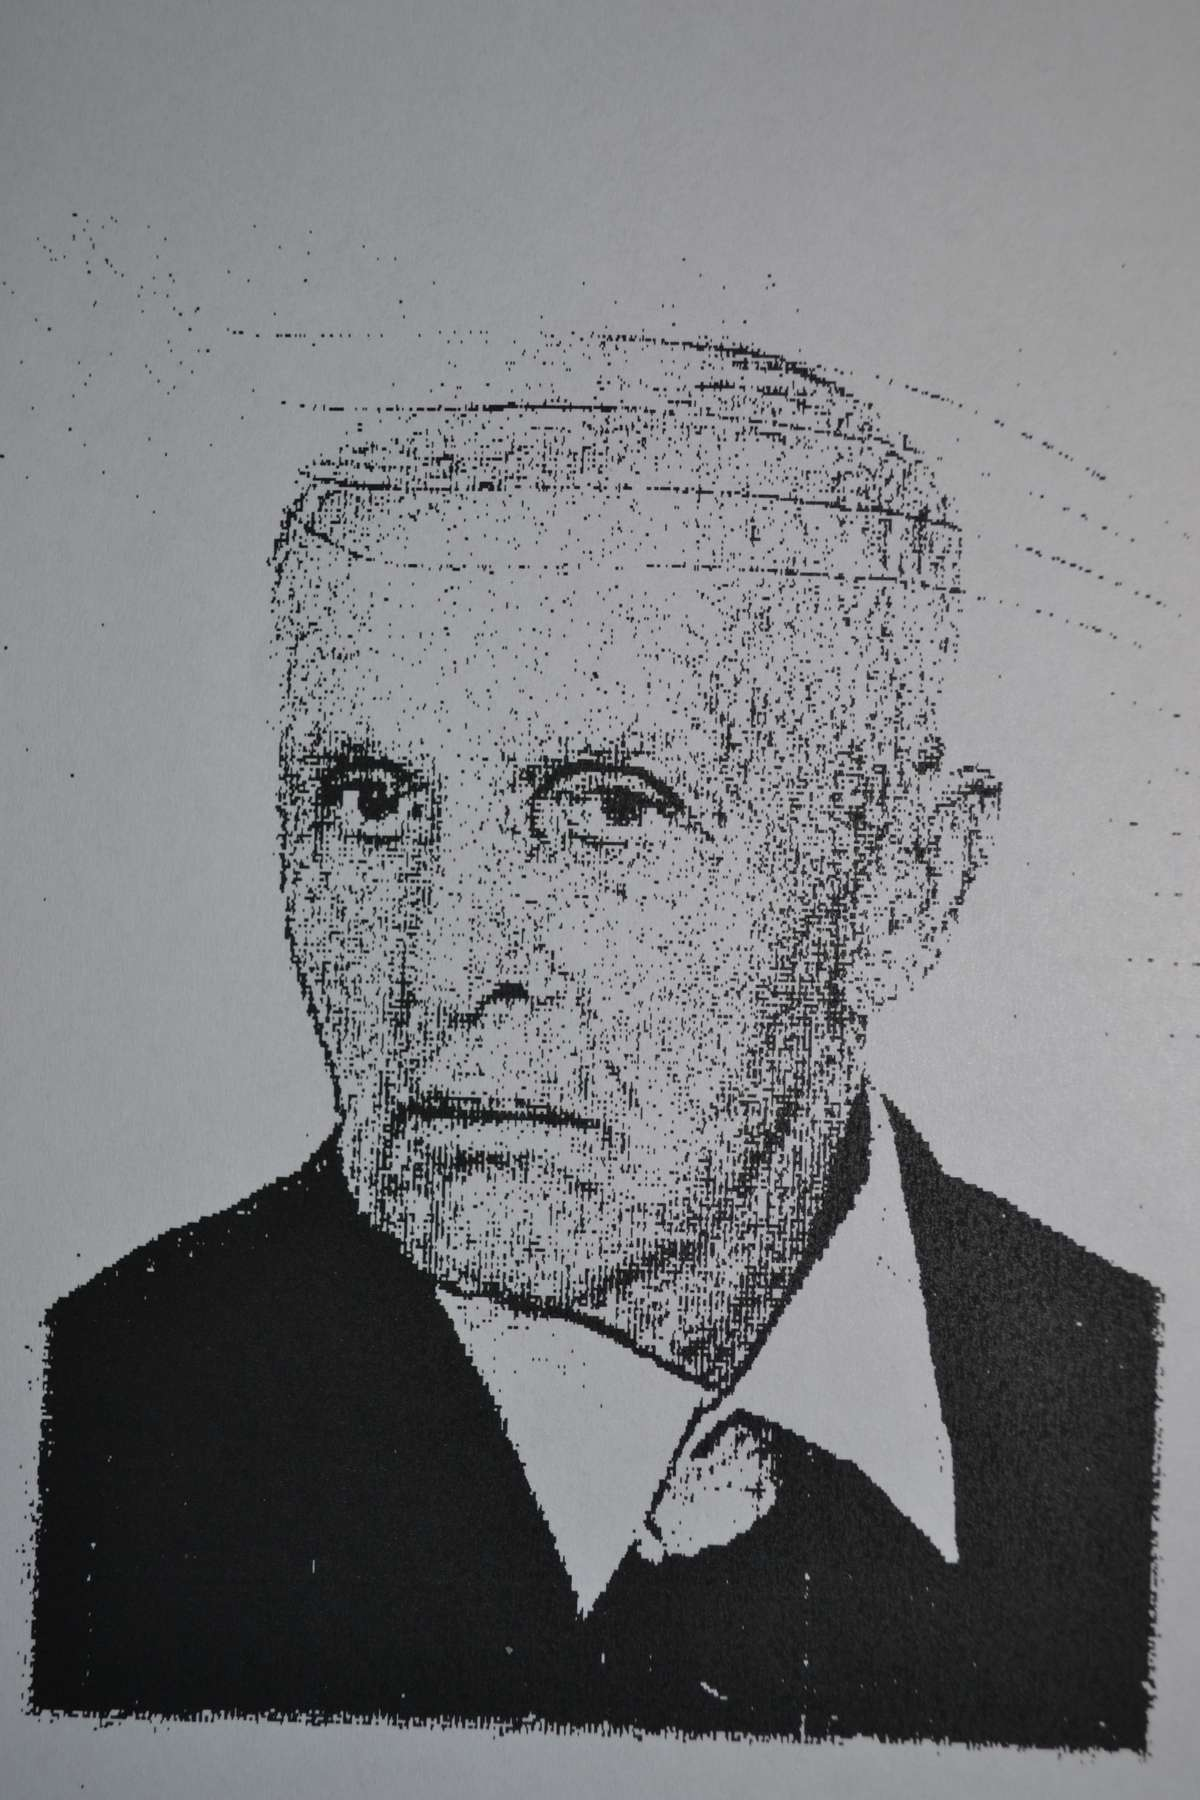 Marian Gostkowski